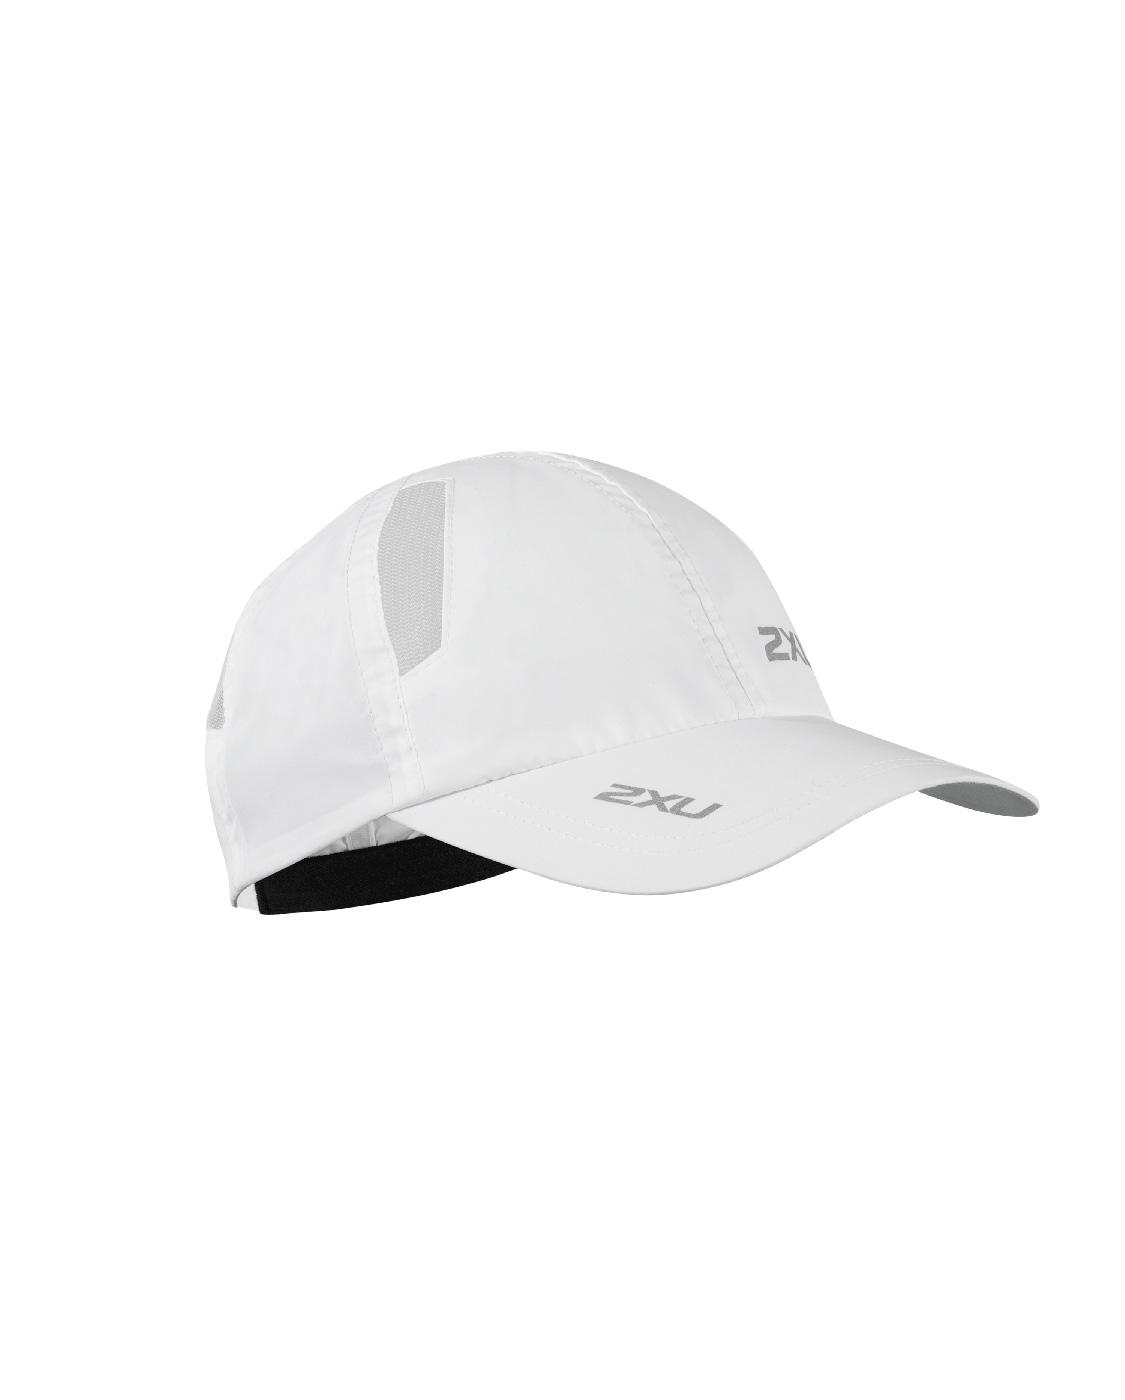 2XU Unisex Run Cap - White/White